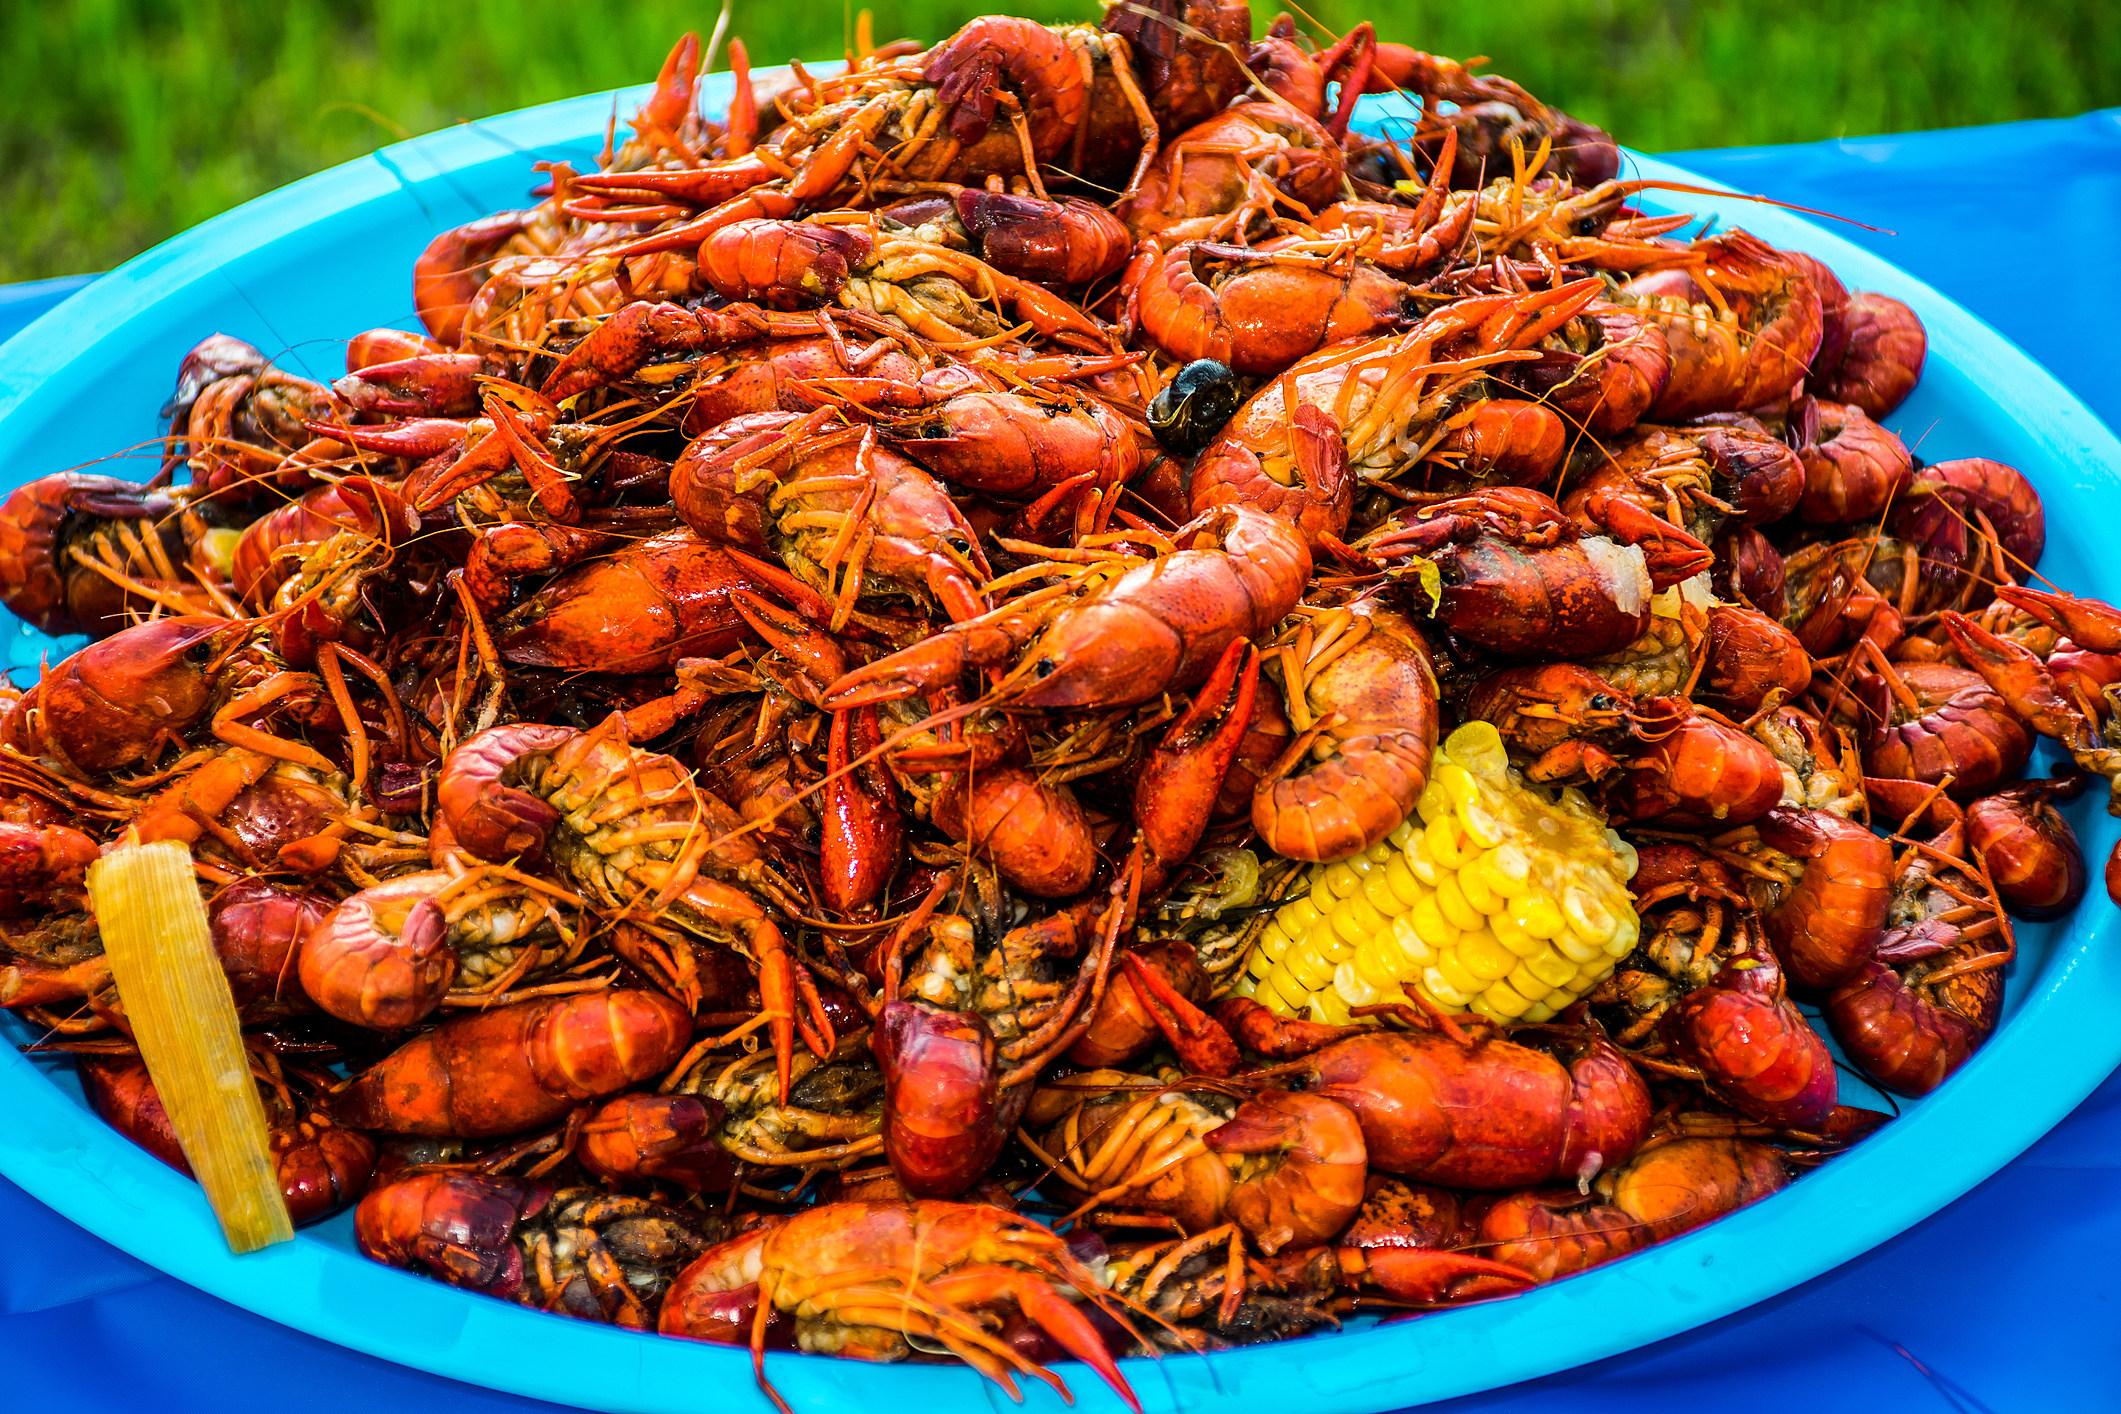 Crawfish Corn Potatoes Shell Fish Piled High Cajun Crawfish Bowl